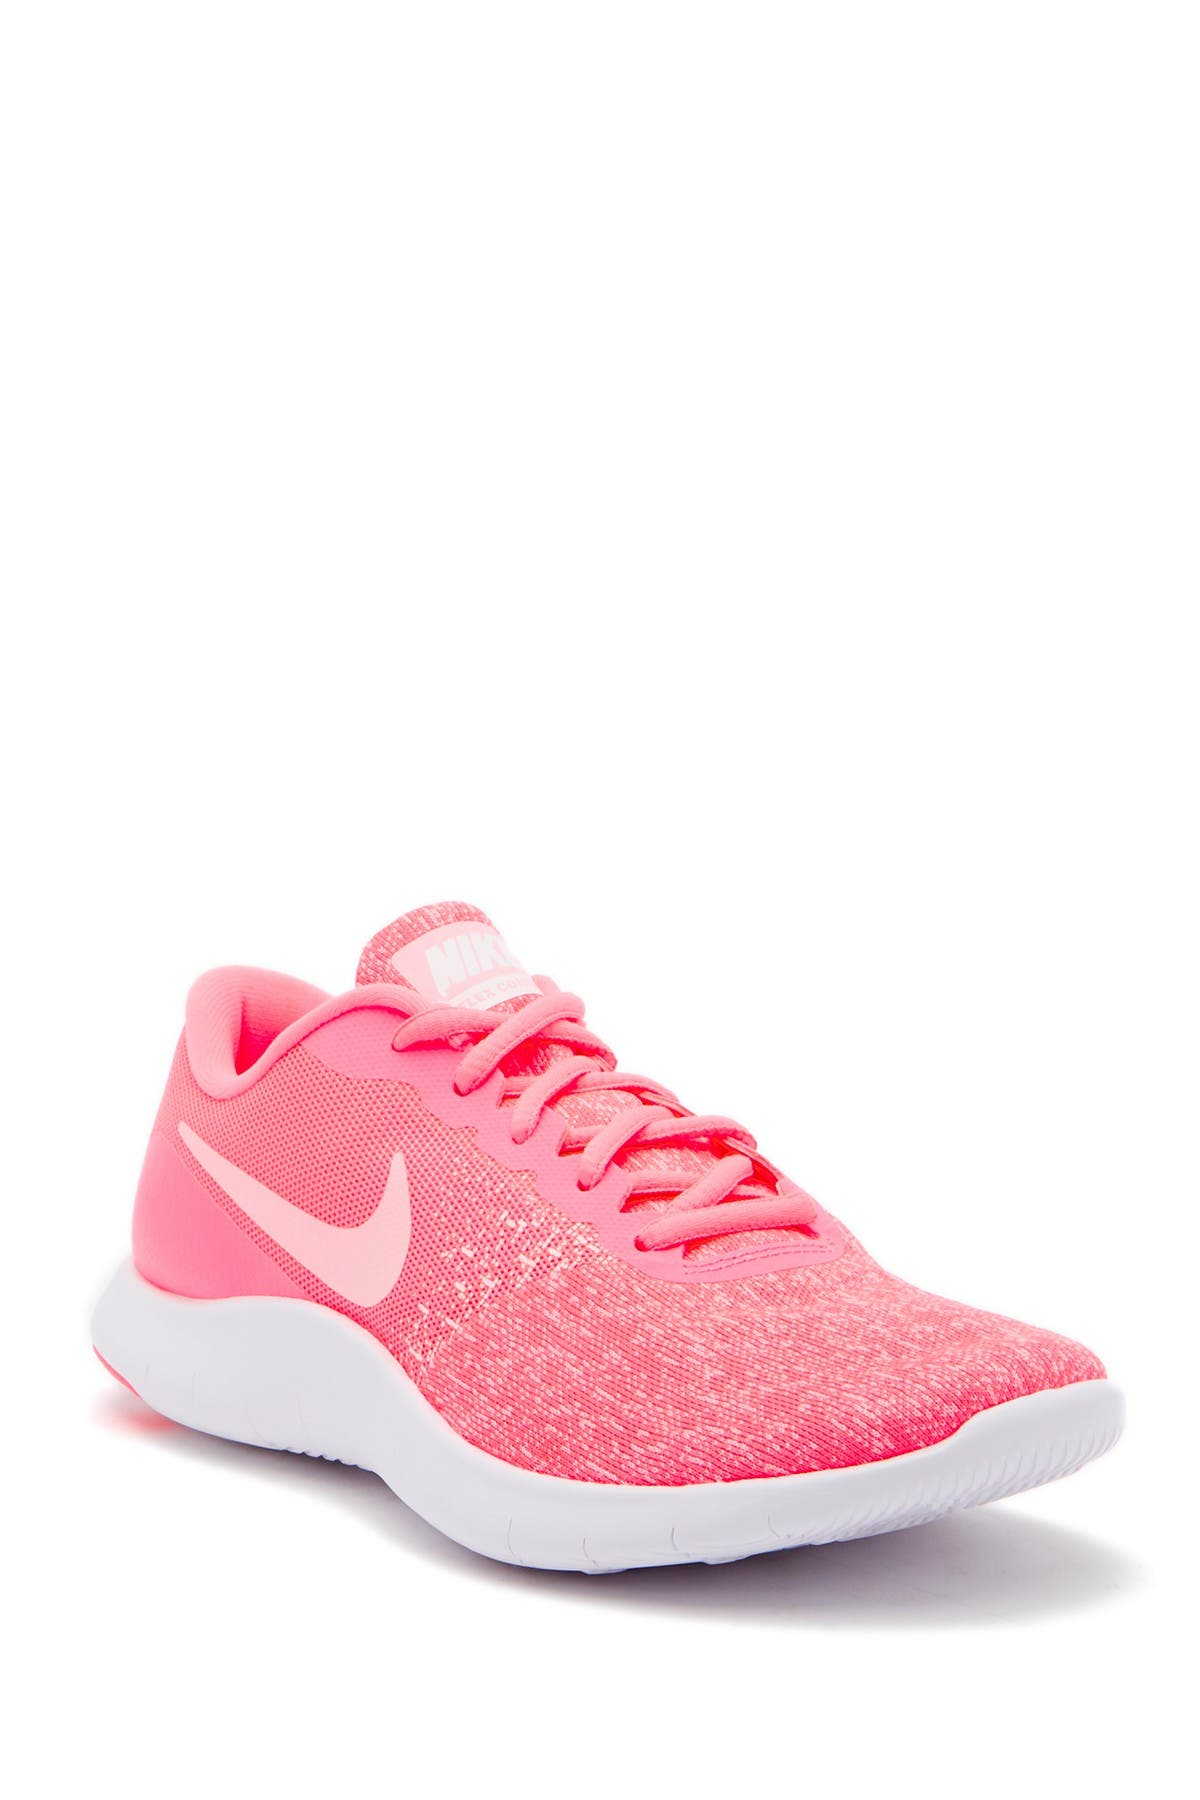 Image of Nike Flex Contact Sneaker